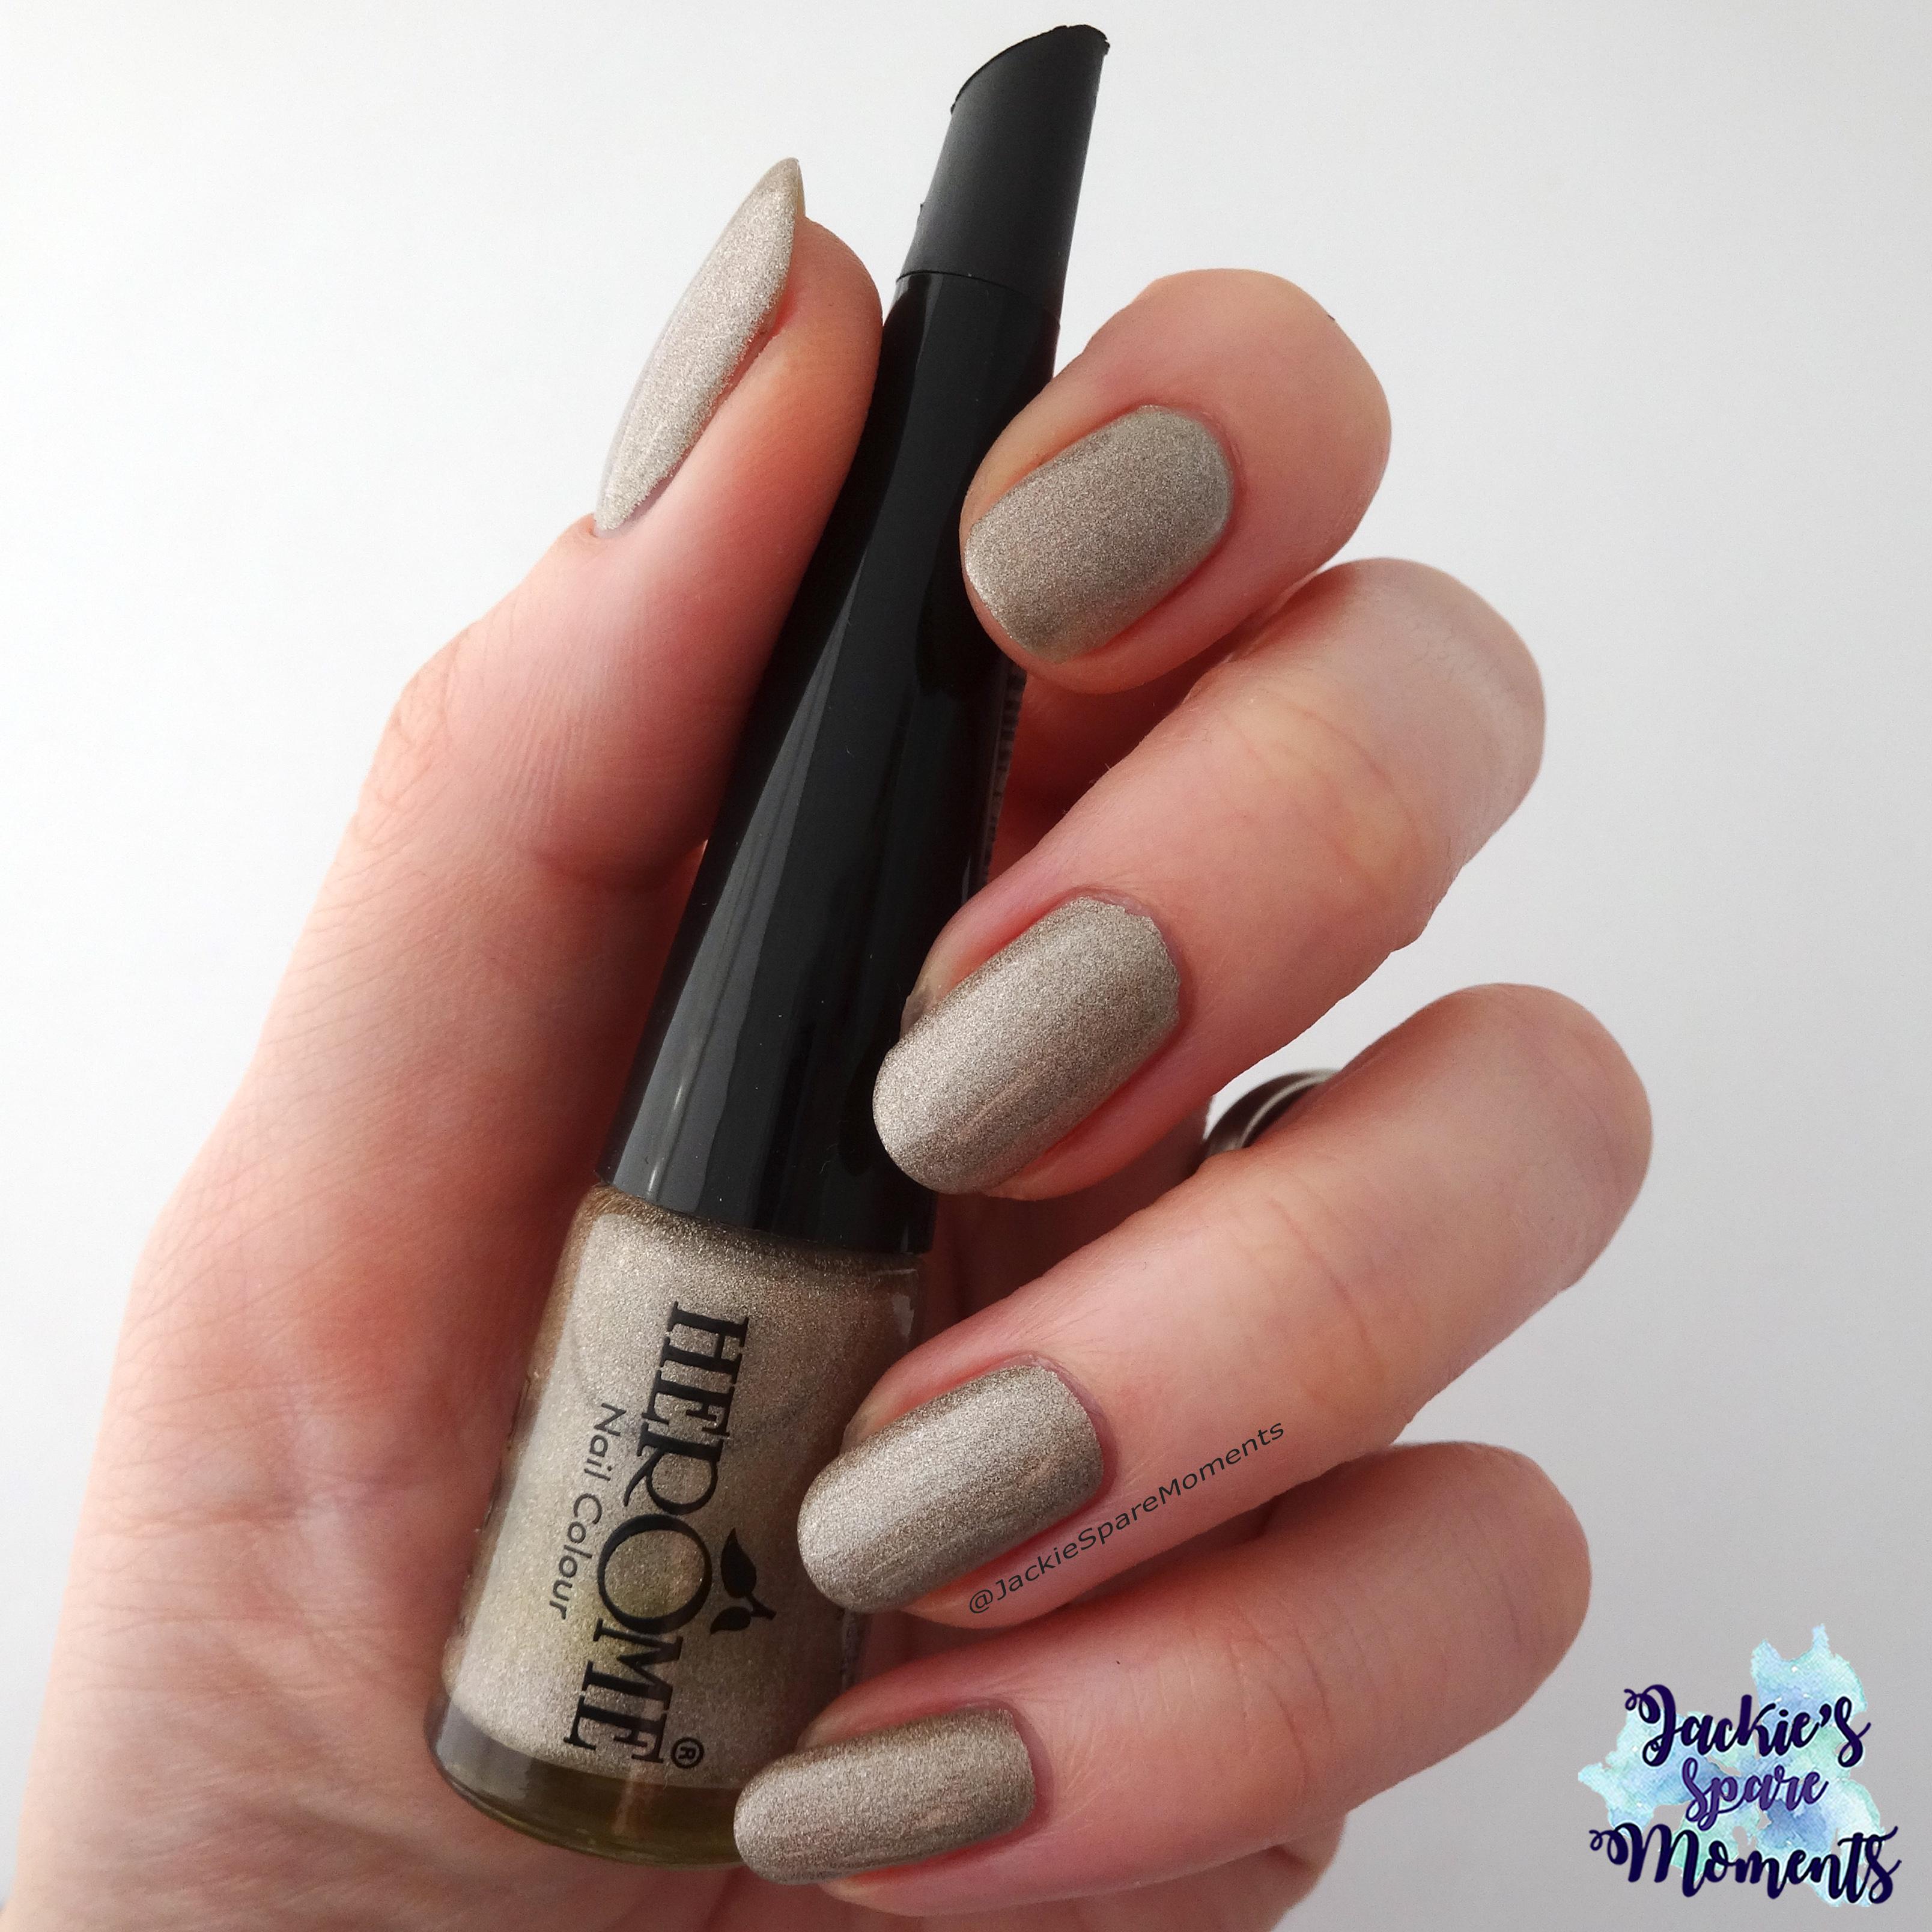 Herome Nail Colour nr 13 as Pantone Almond Buff